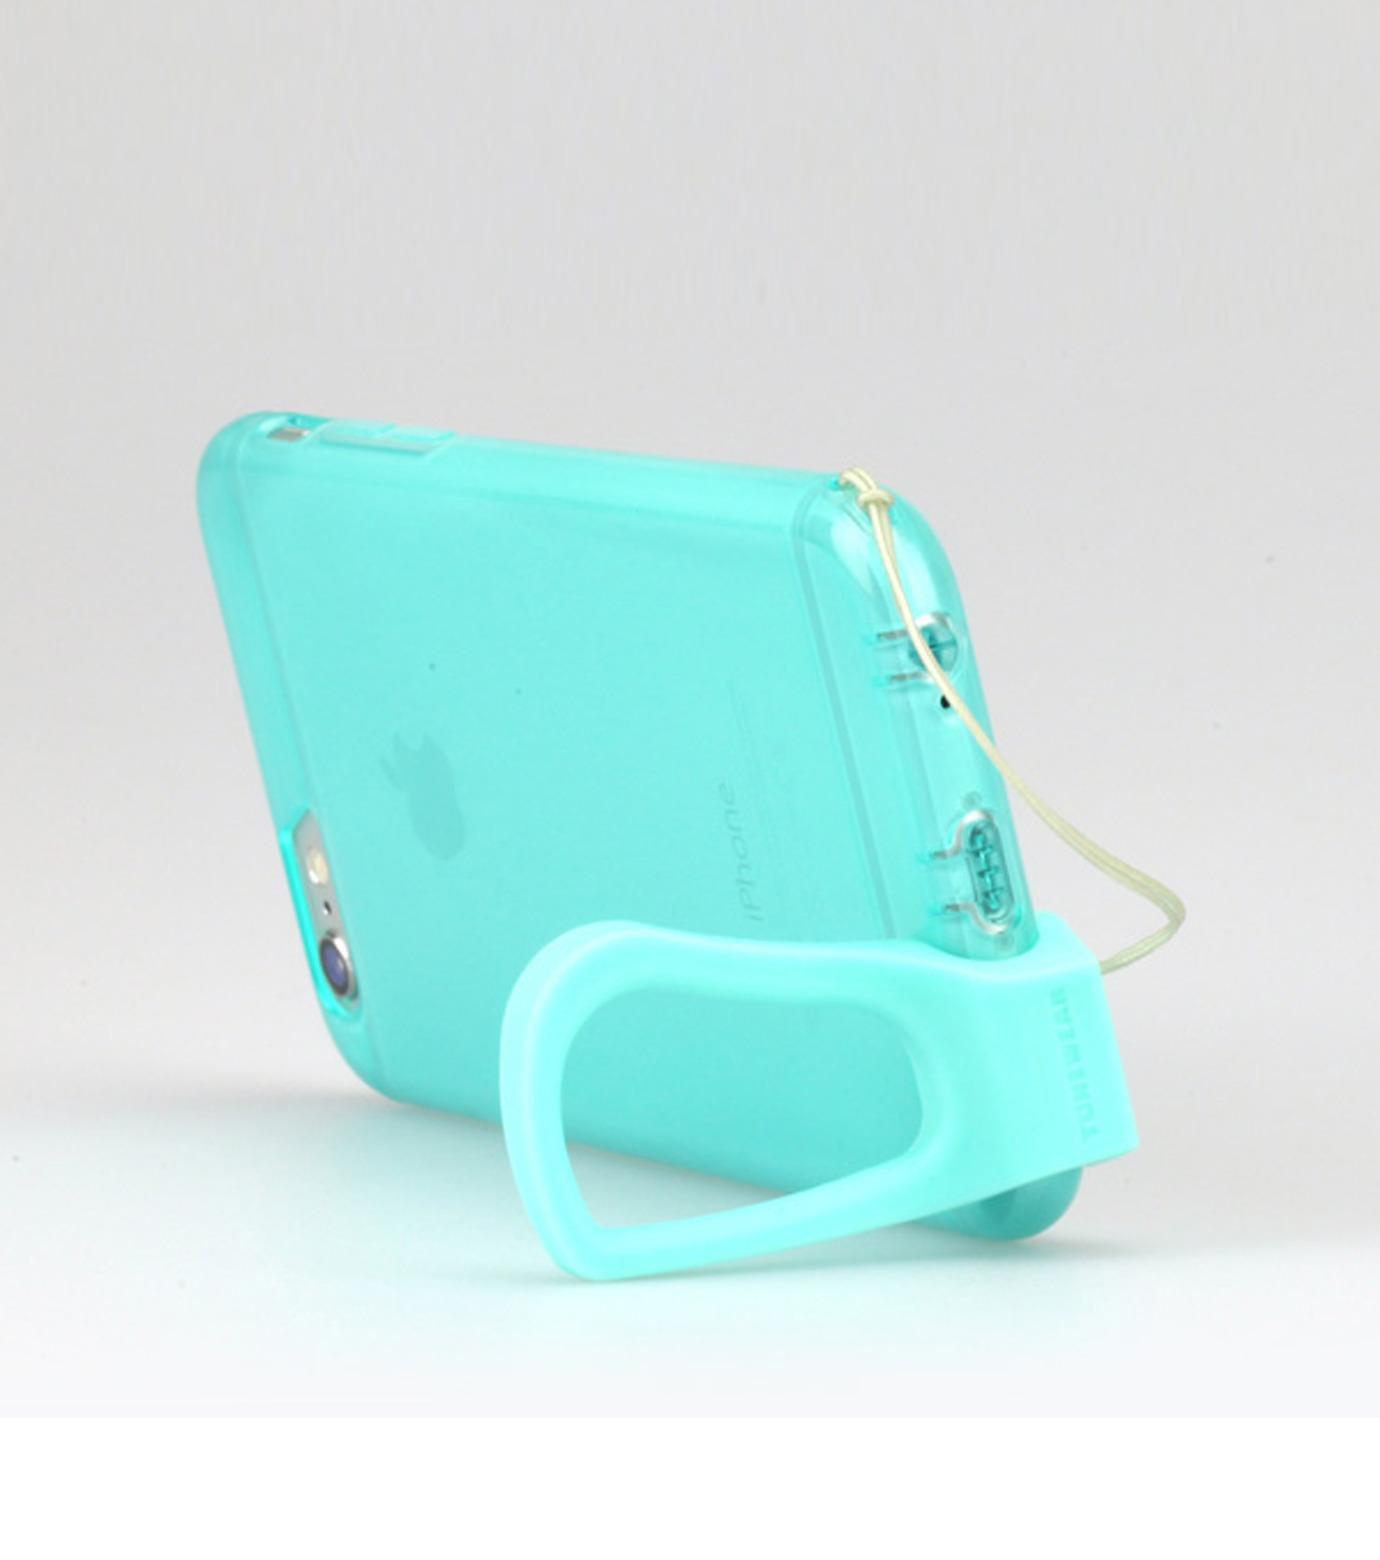 Tunewear(チューンウエア)のsoftshell 6/6s-CHARCHOL GRAY(ケースiphone6/6s/case iphone6/6s)-TUN-PH-0399-12 拡大詳細画像7